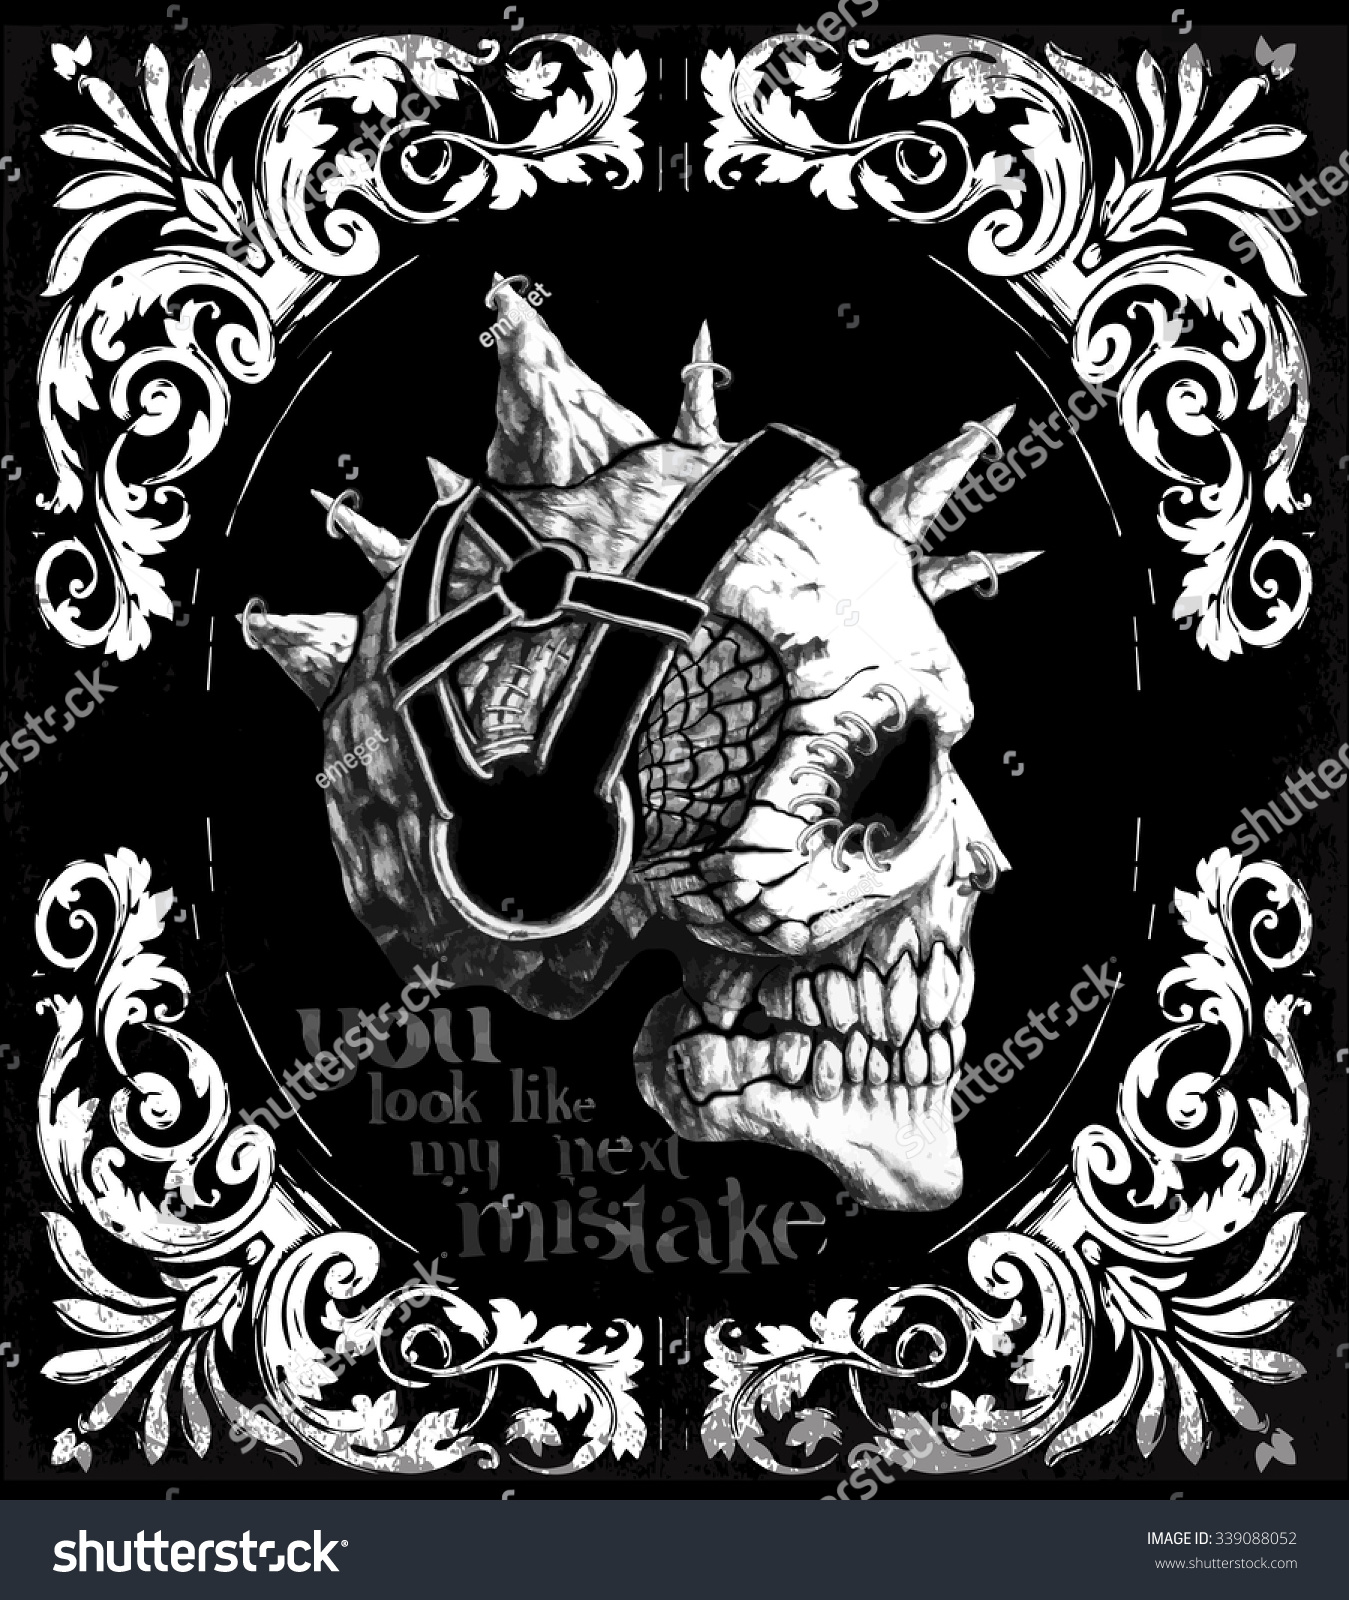 Design t shirt artwork - Design T Shirt Artwork Vintage Skull T Shirt Graphic Design